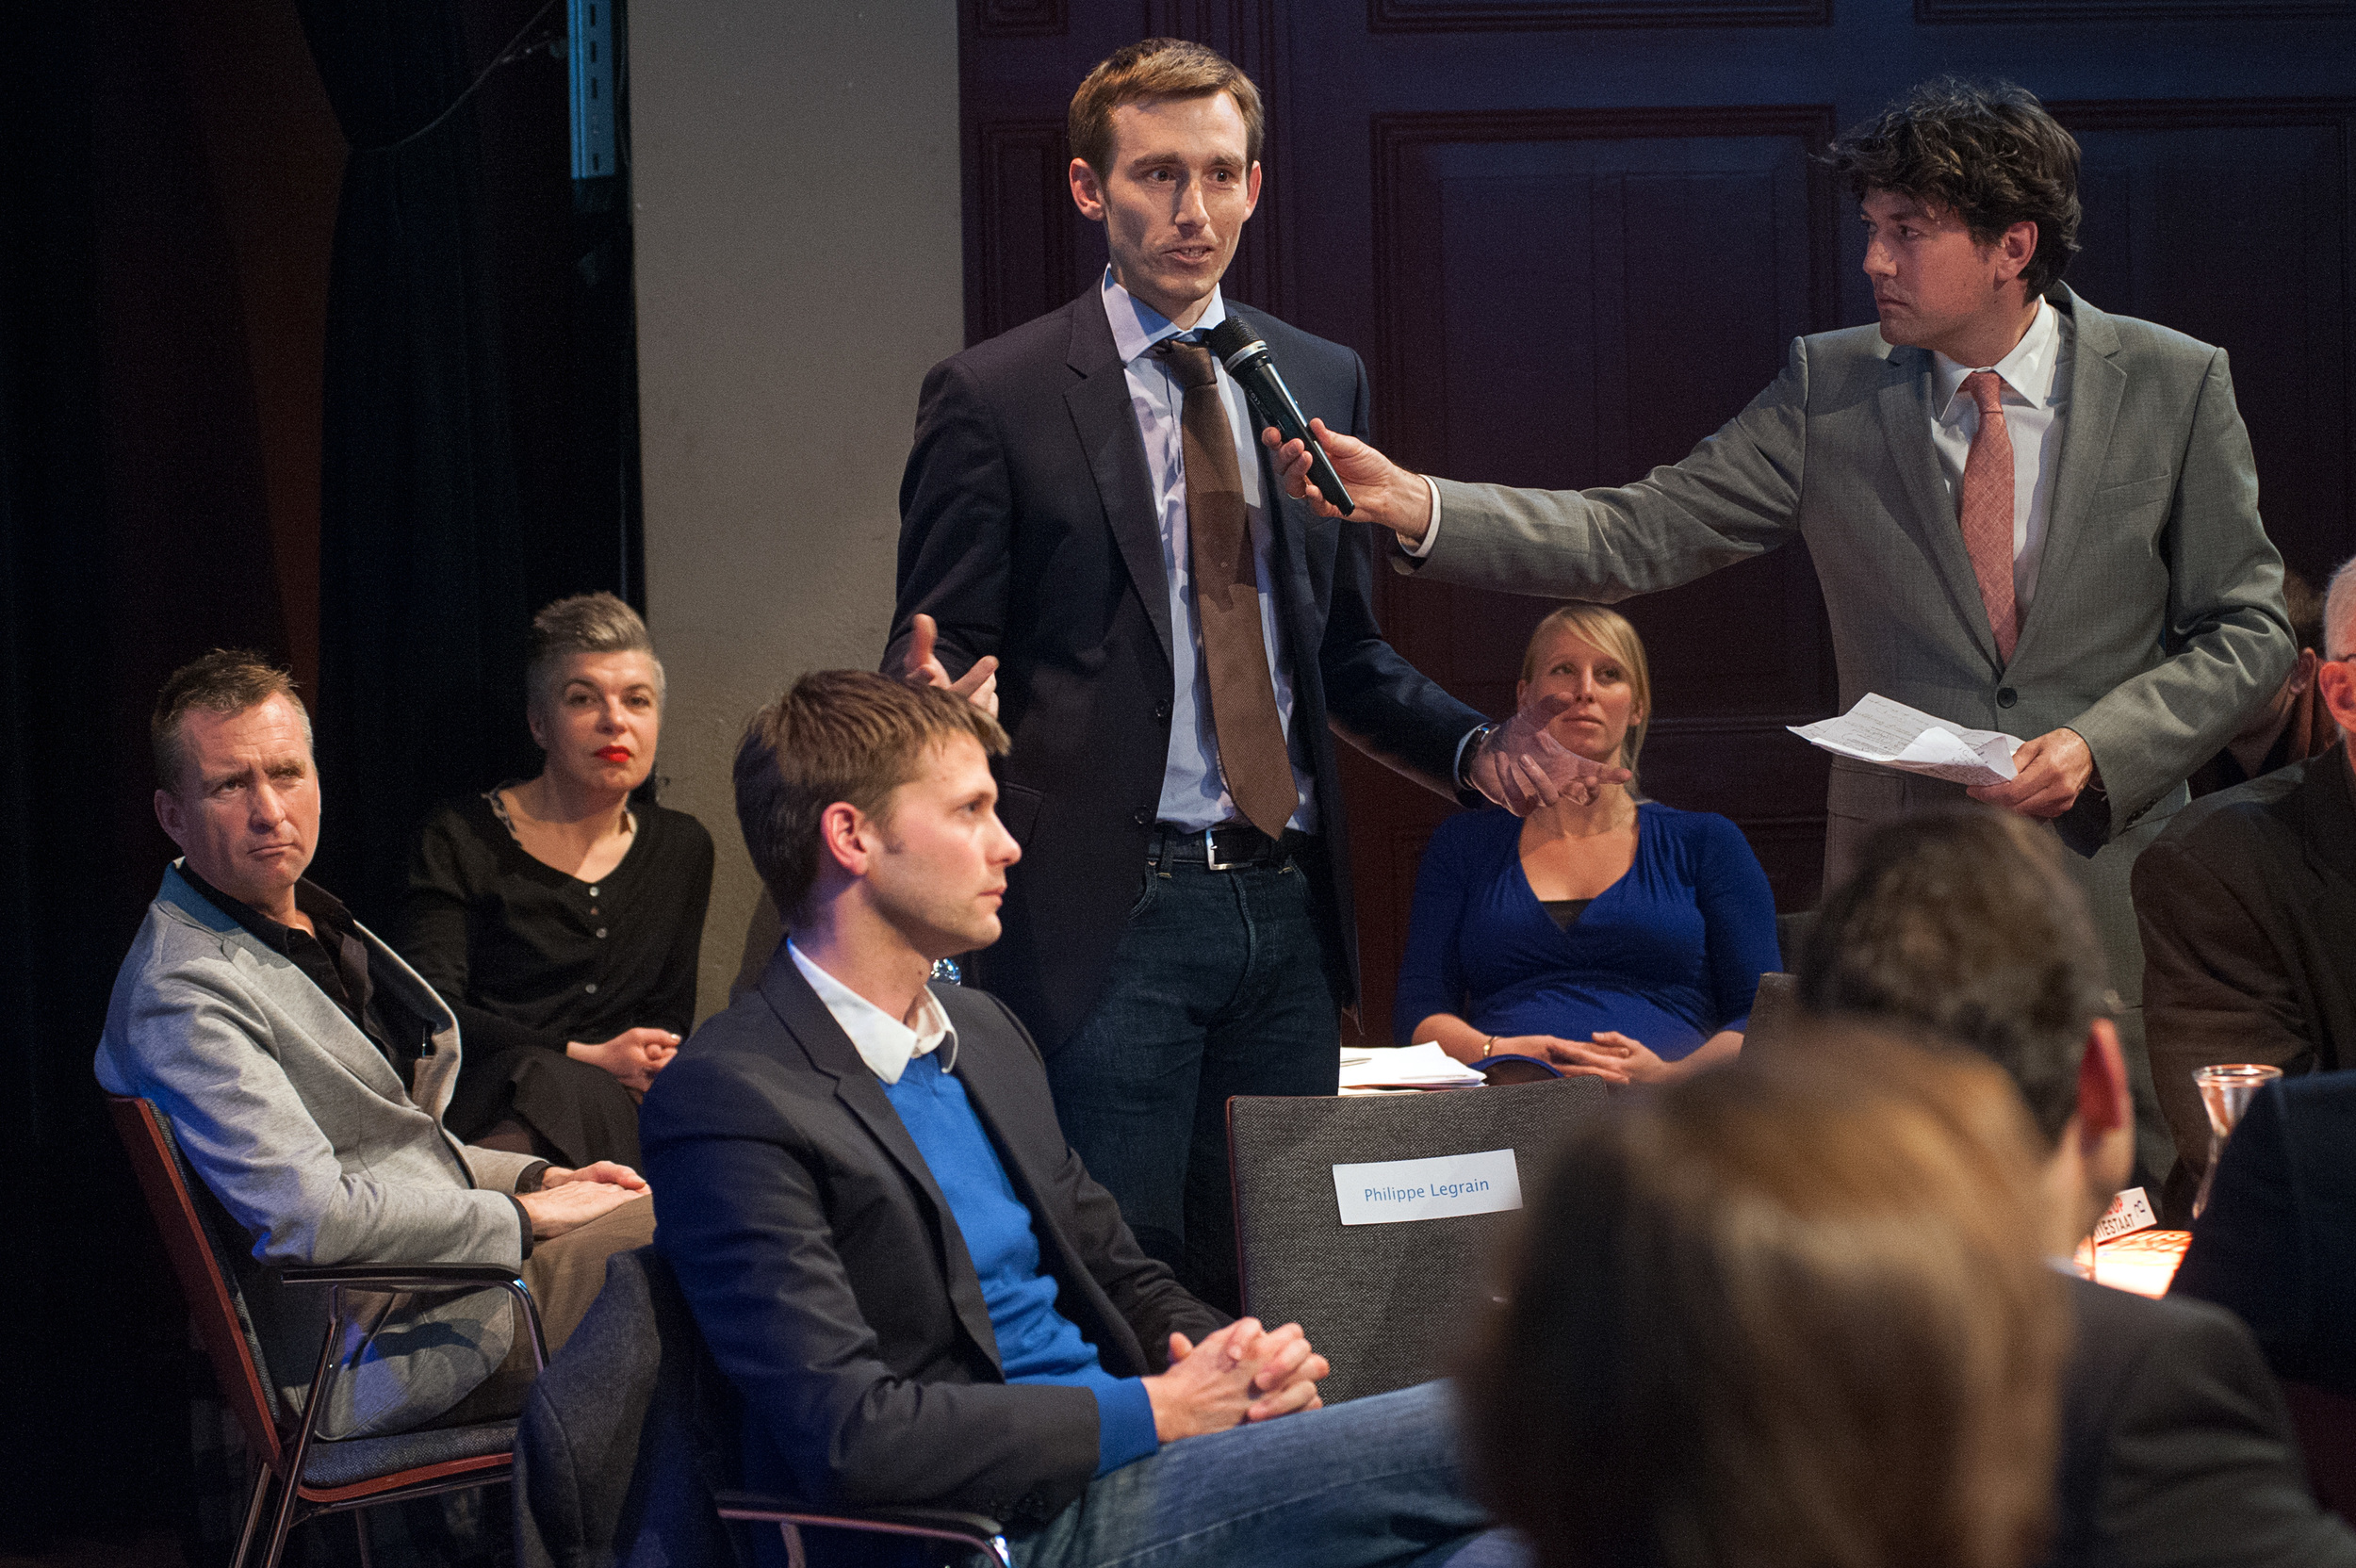 Panelist Dirk Goting ©Jan Boeve